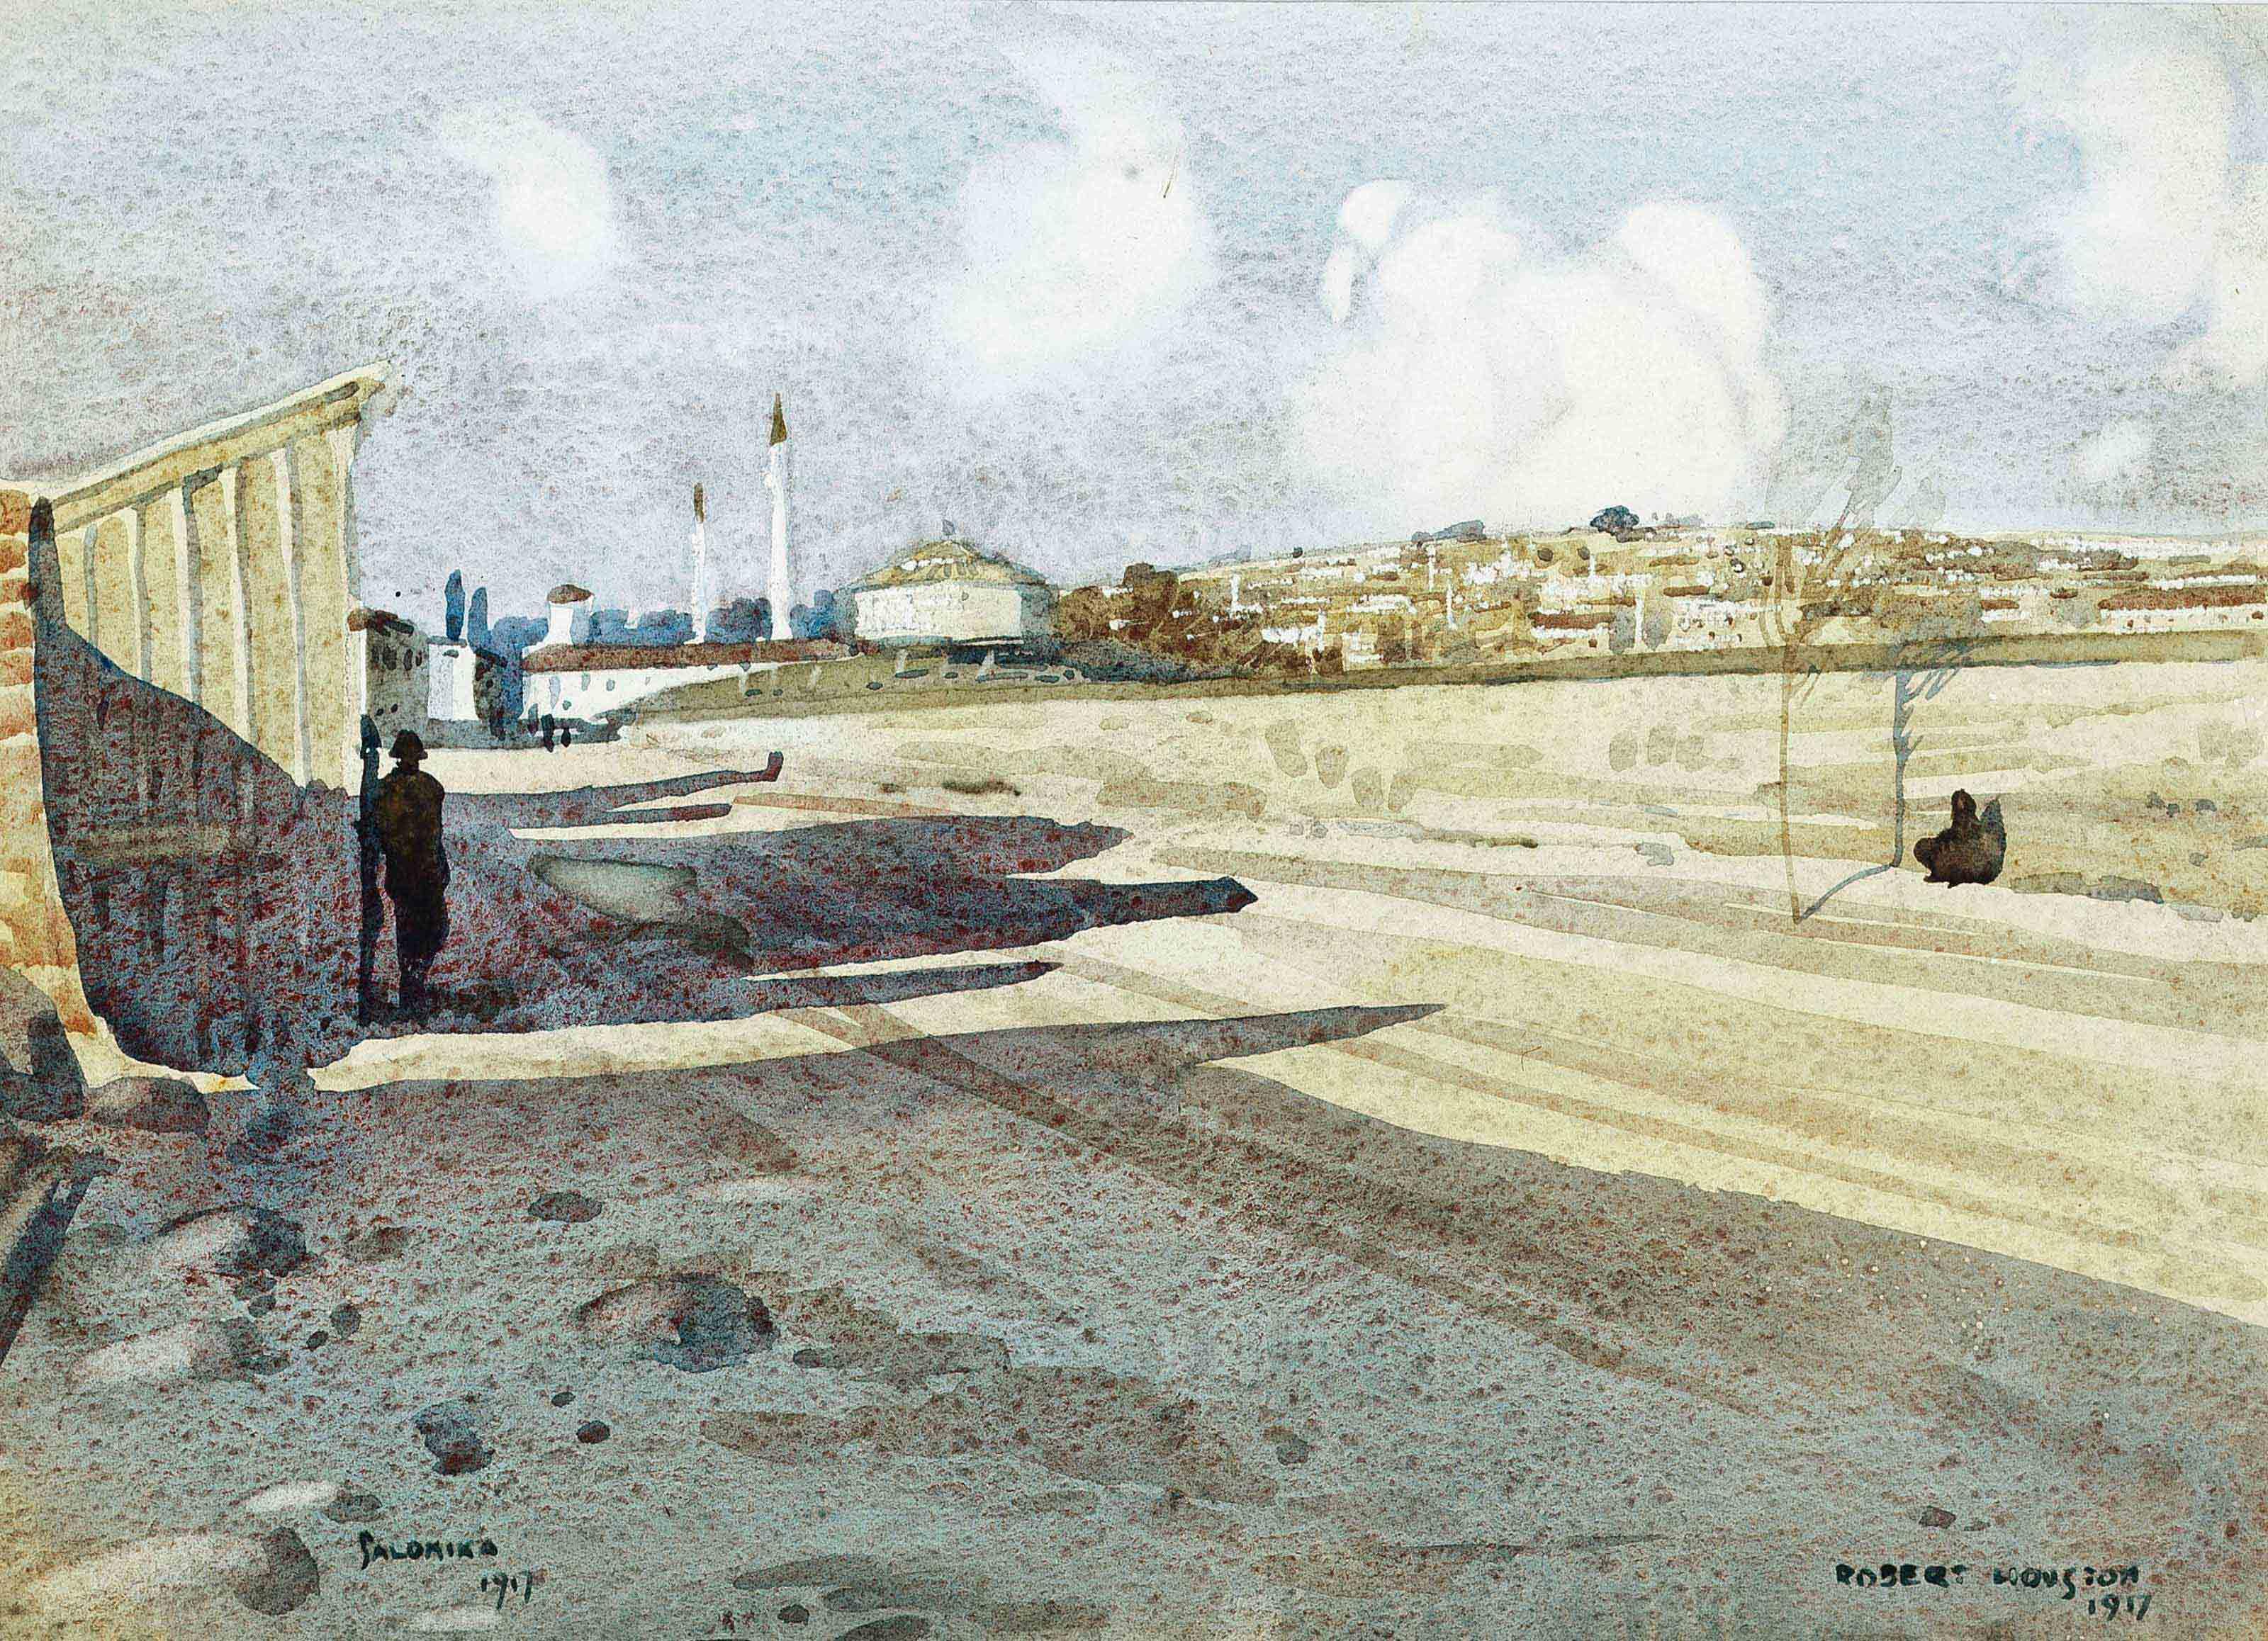 Salonika, Greece, 1917